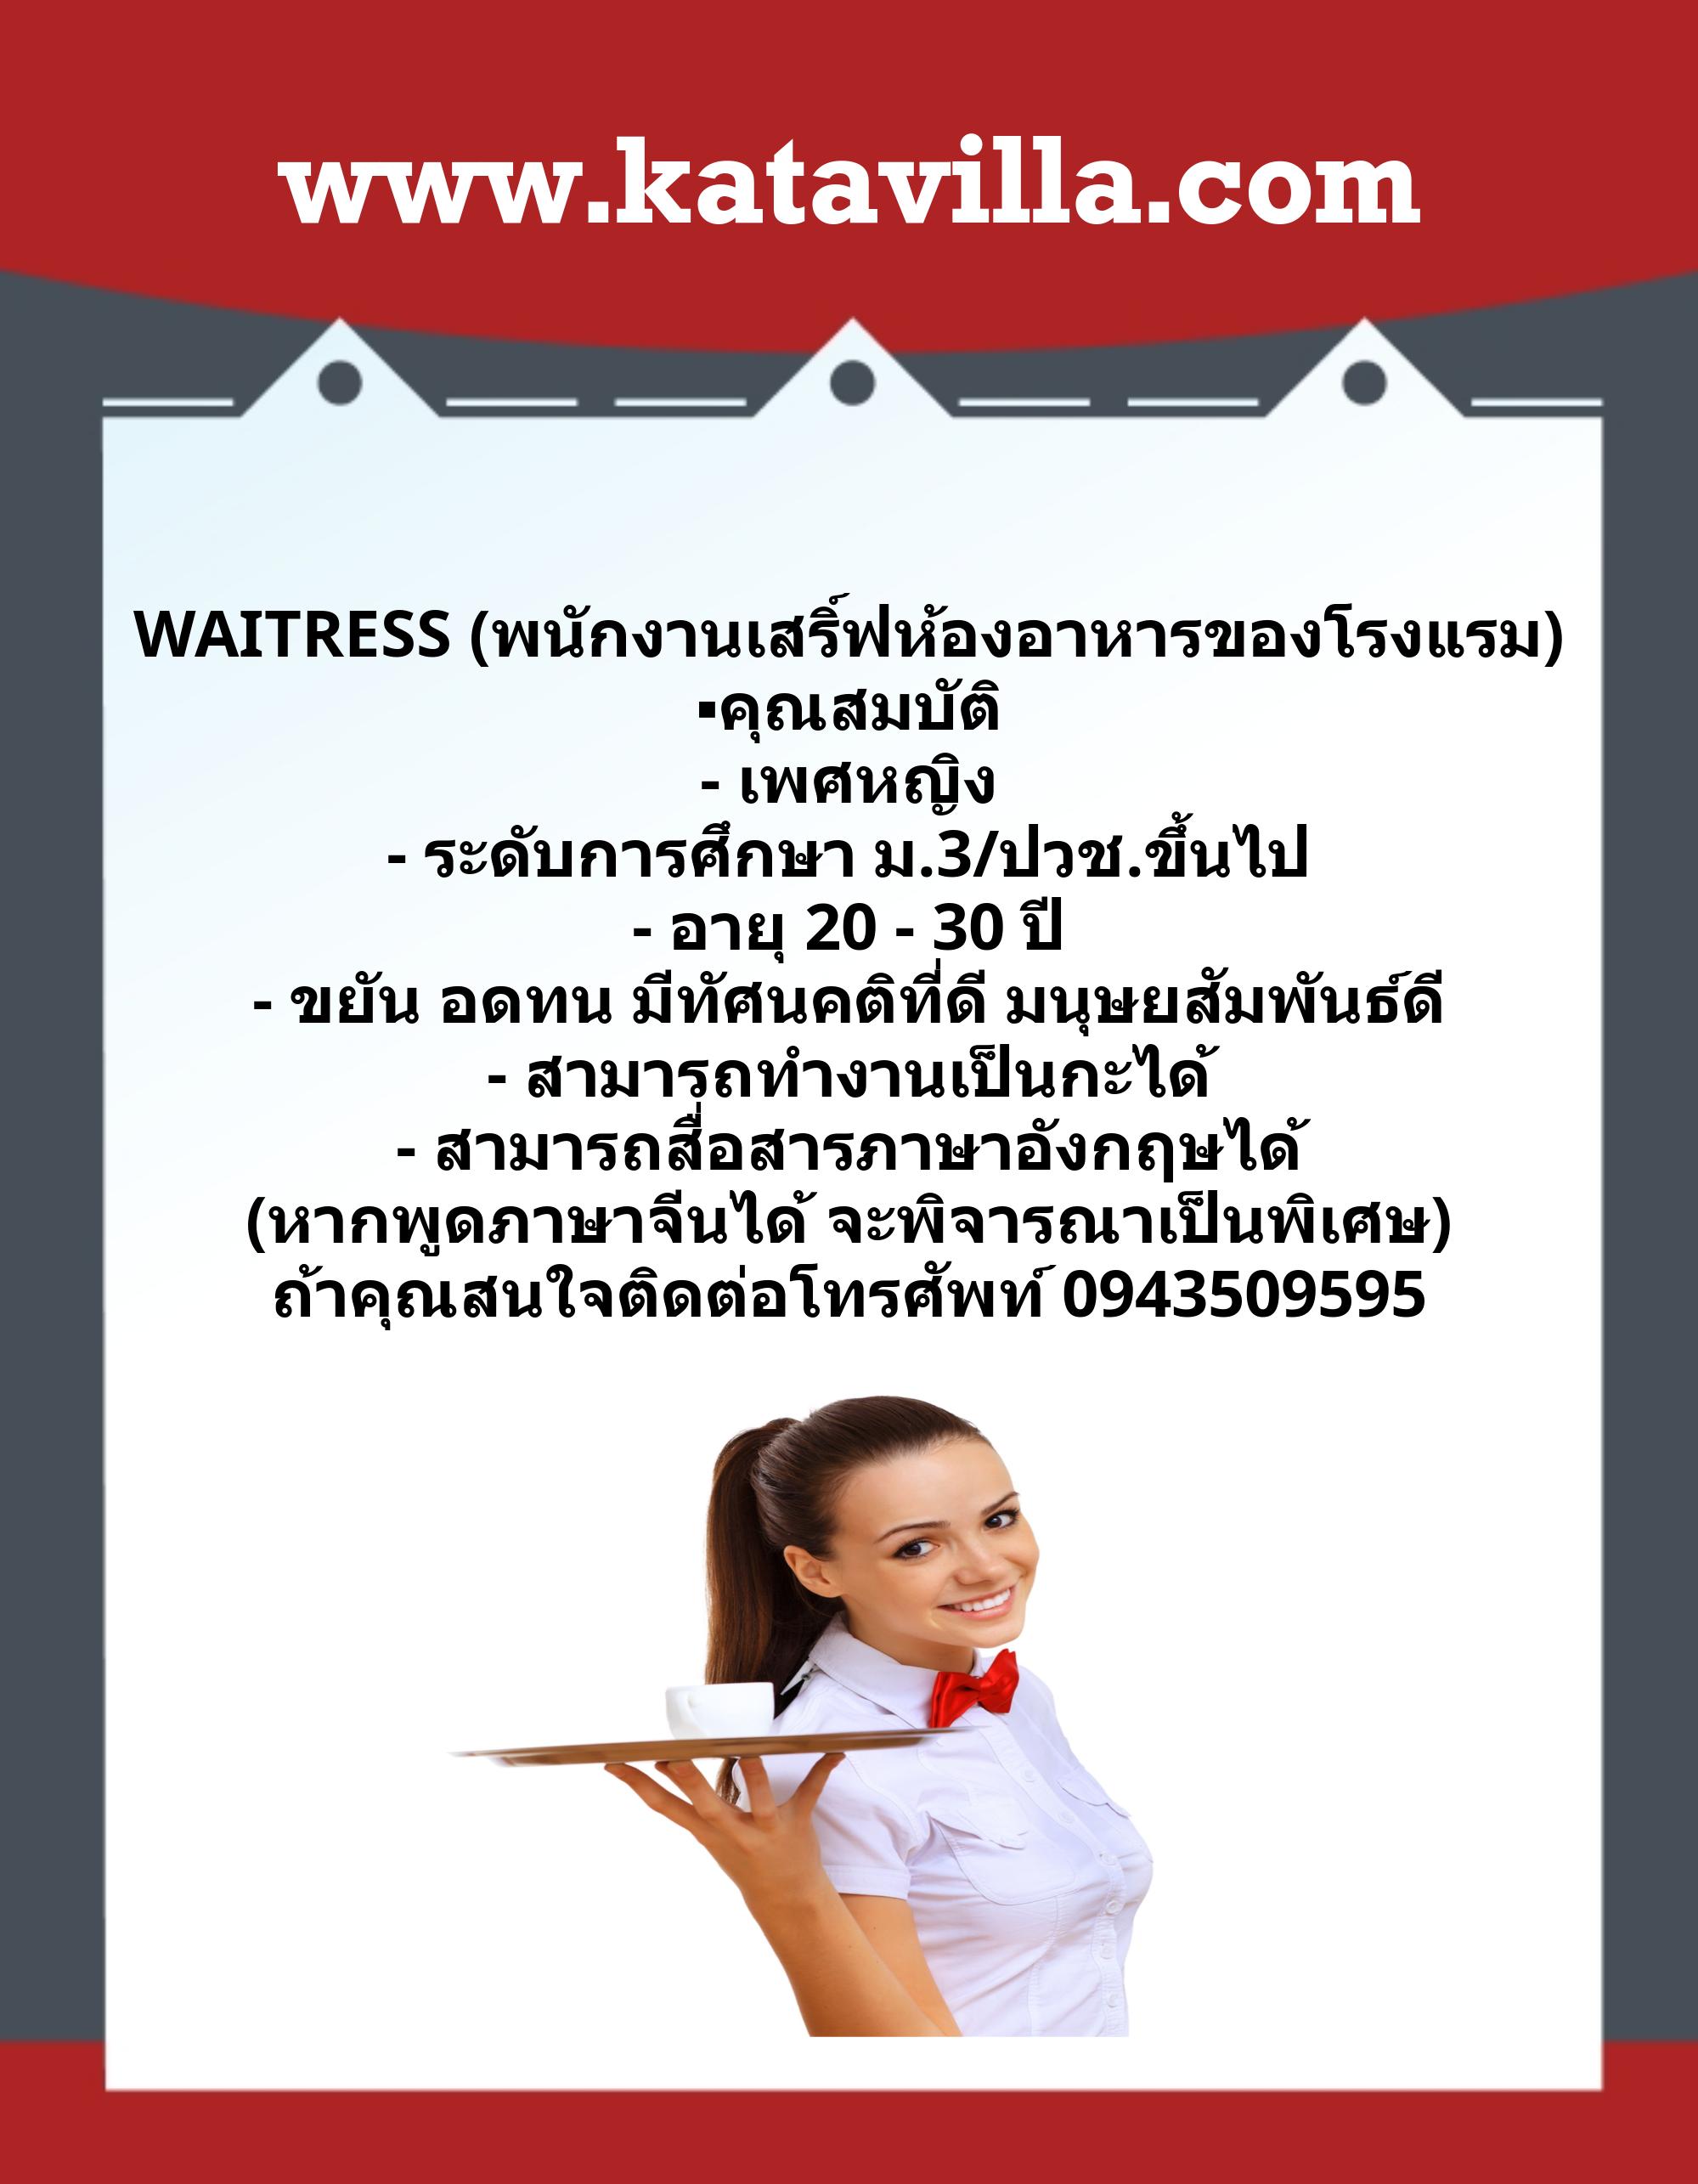 WAITRESS (1)